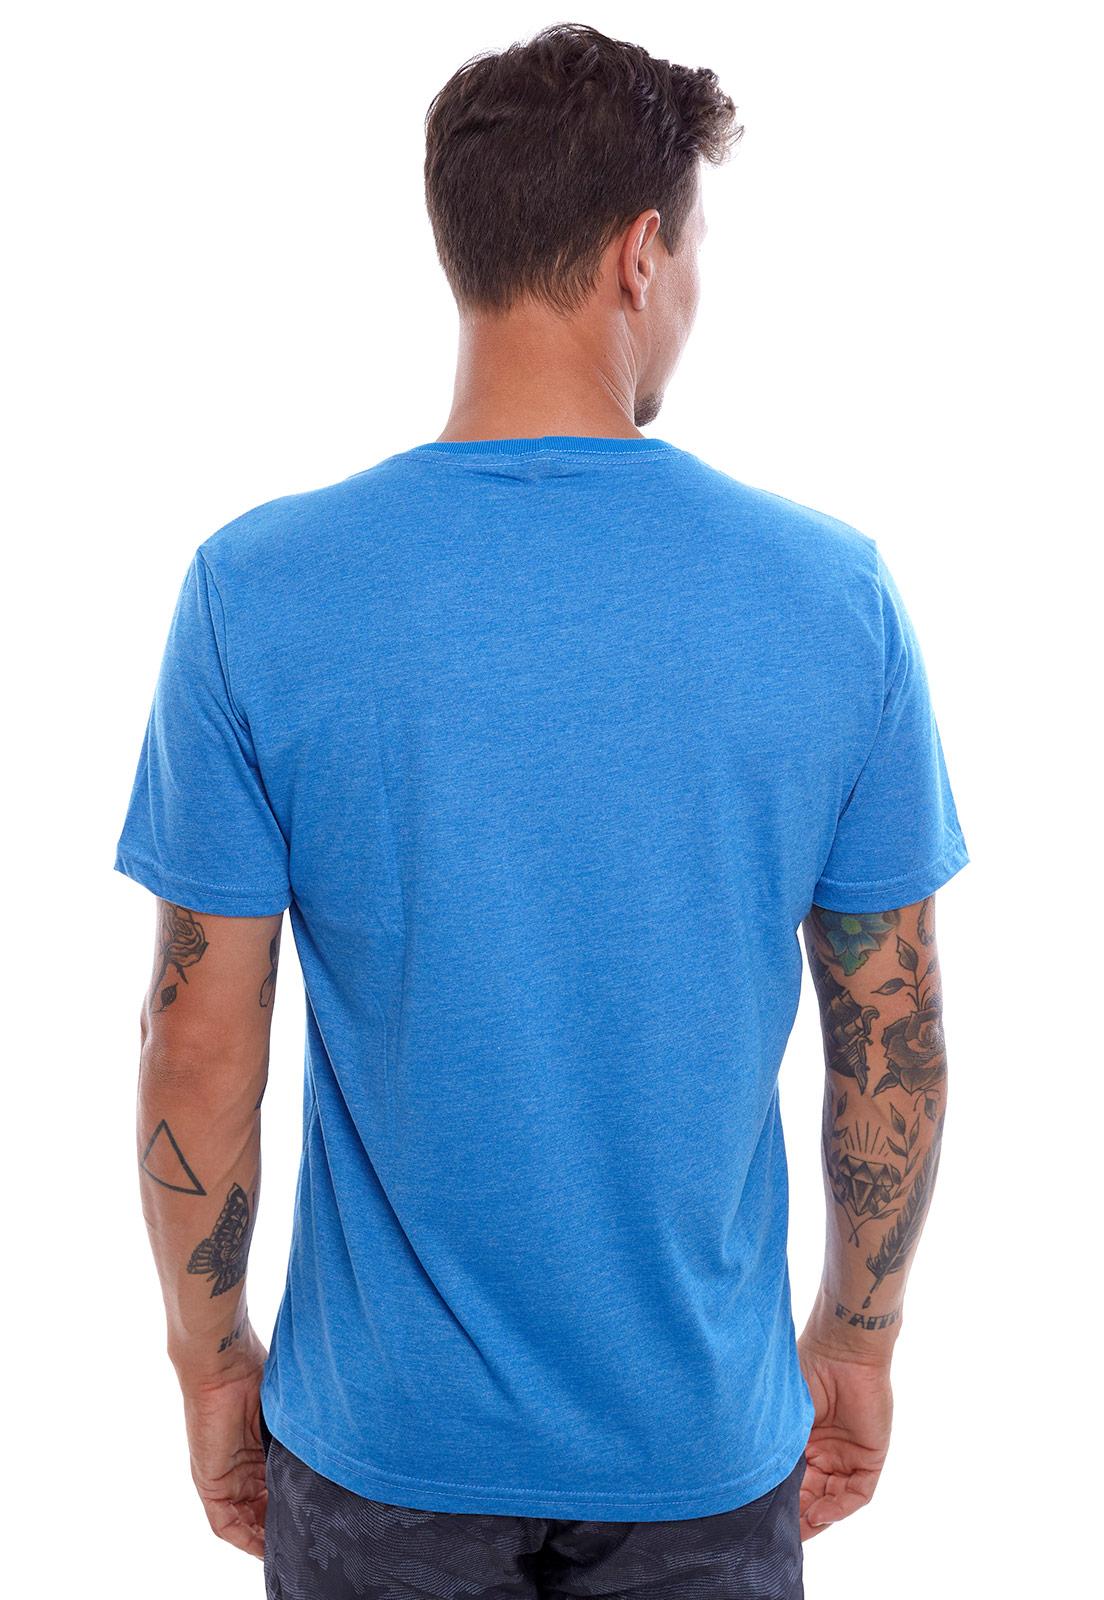 Camiseta Vida Marinha Manga Curta Azul Royal